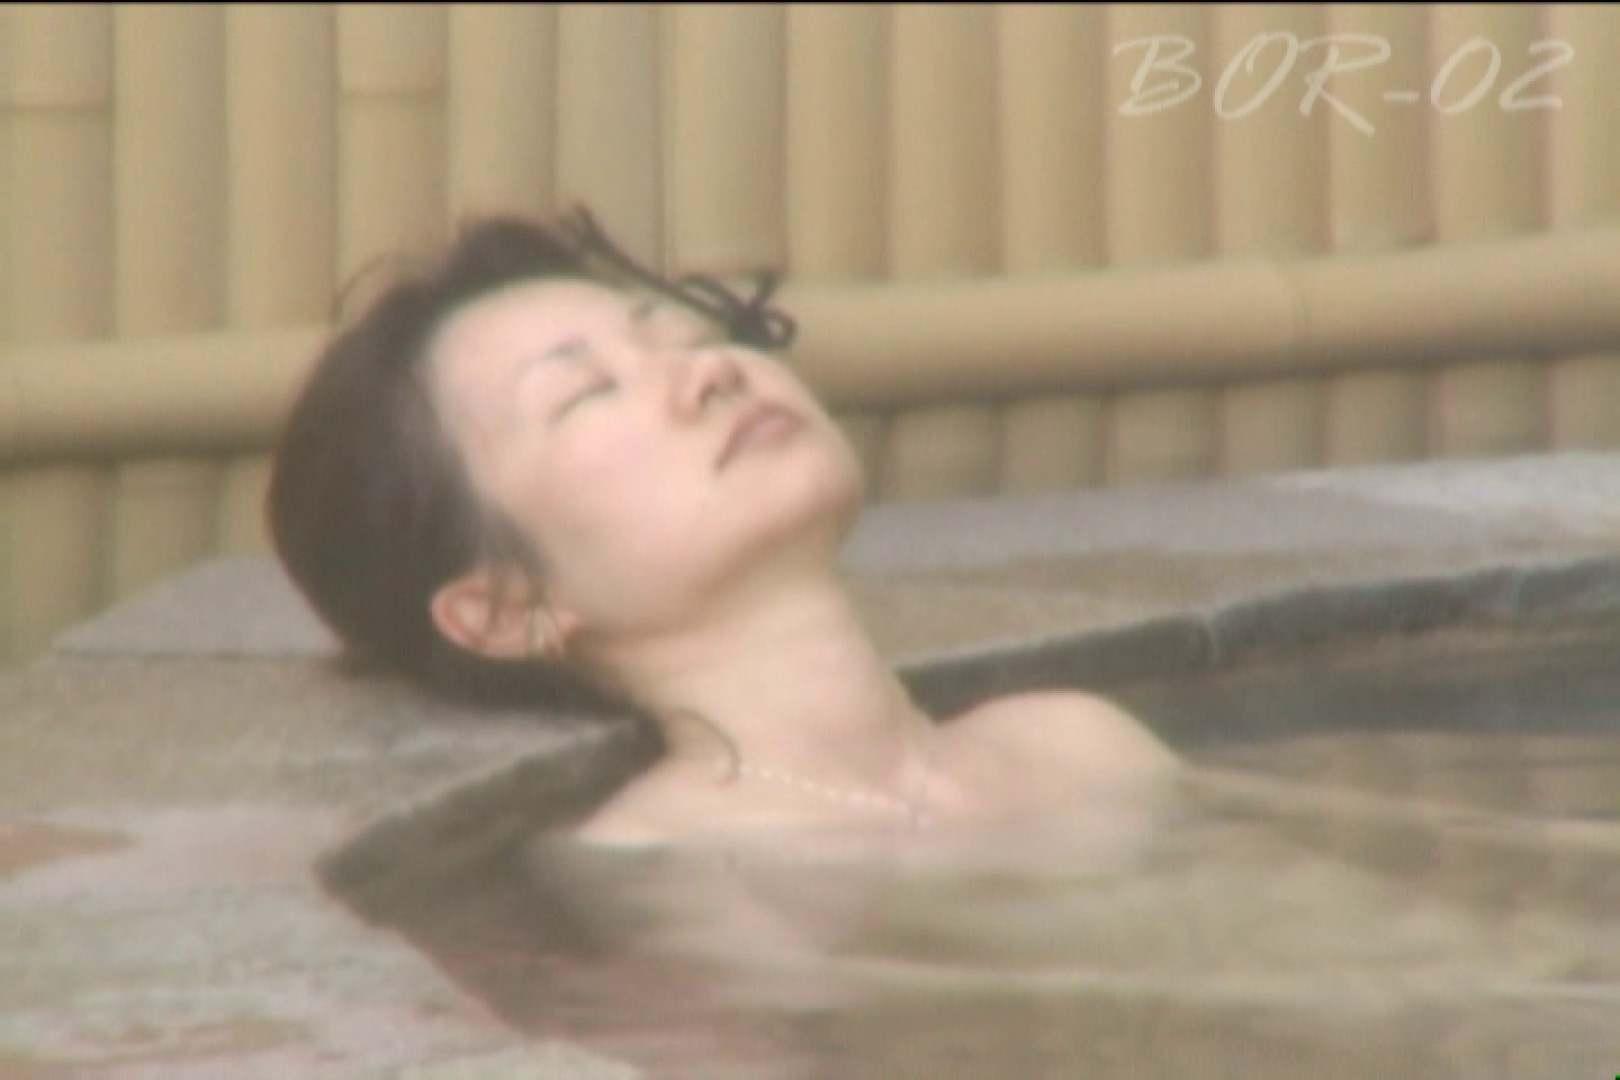 Aquaな露天風呂Vol.477 OLセックス 盗撮われめAV動画紹介 86画像 53